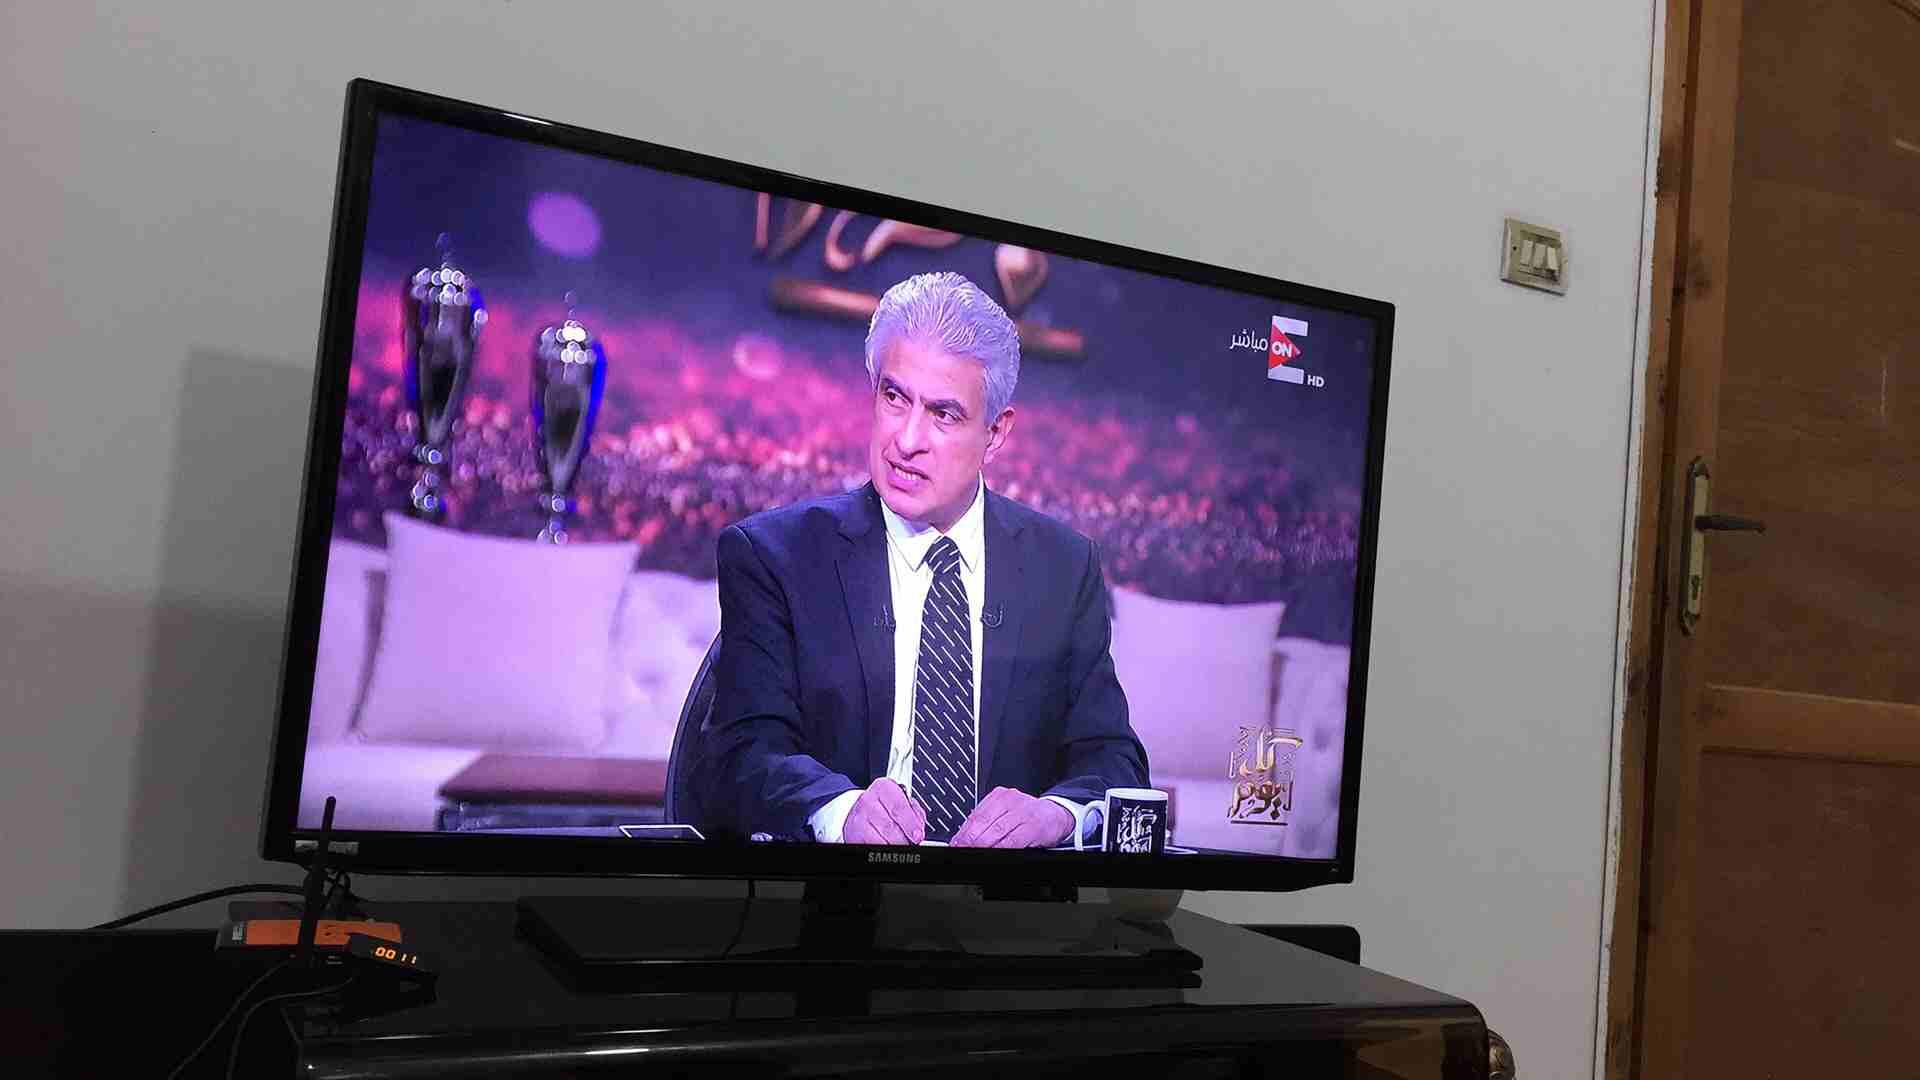 Tv for sale-  شاشة سامسونغ 43 بوصة لا...